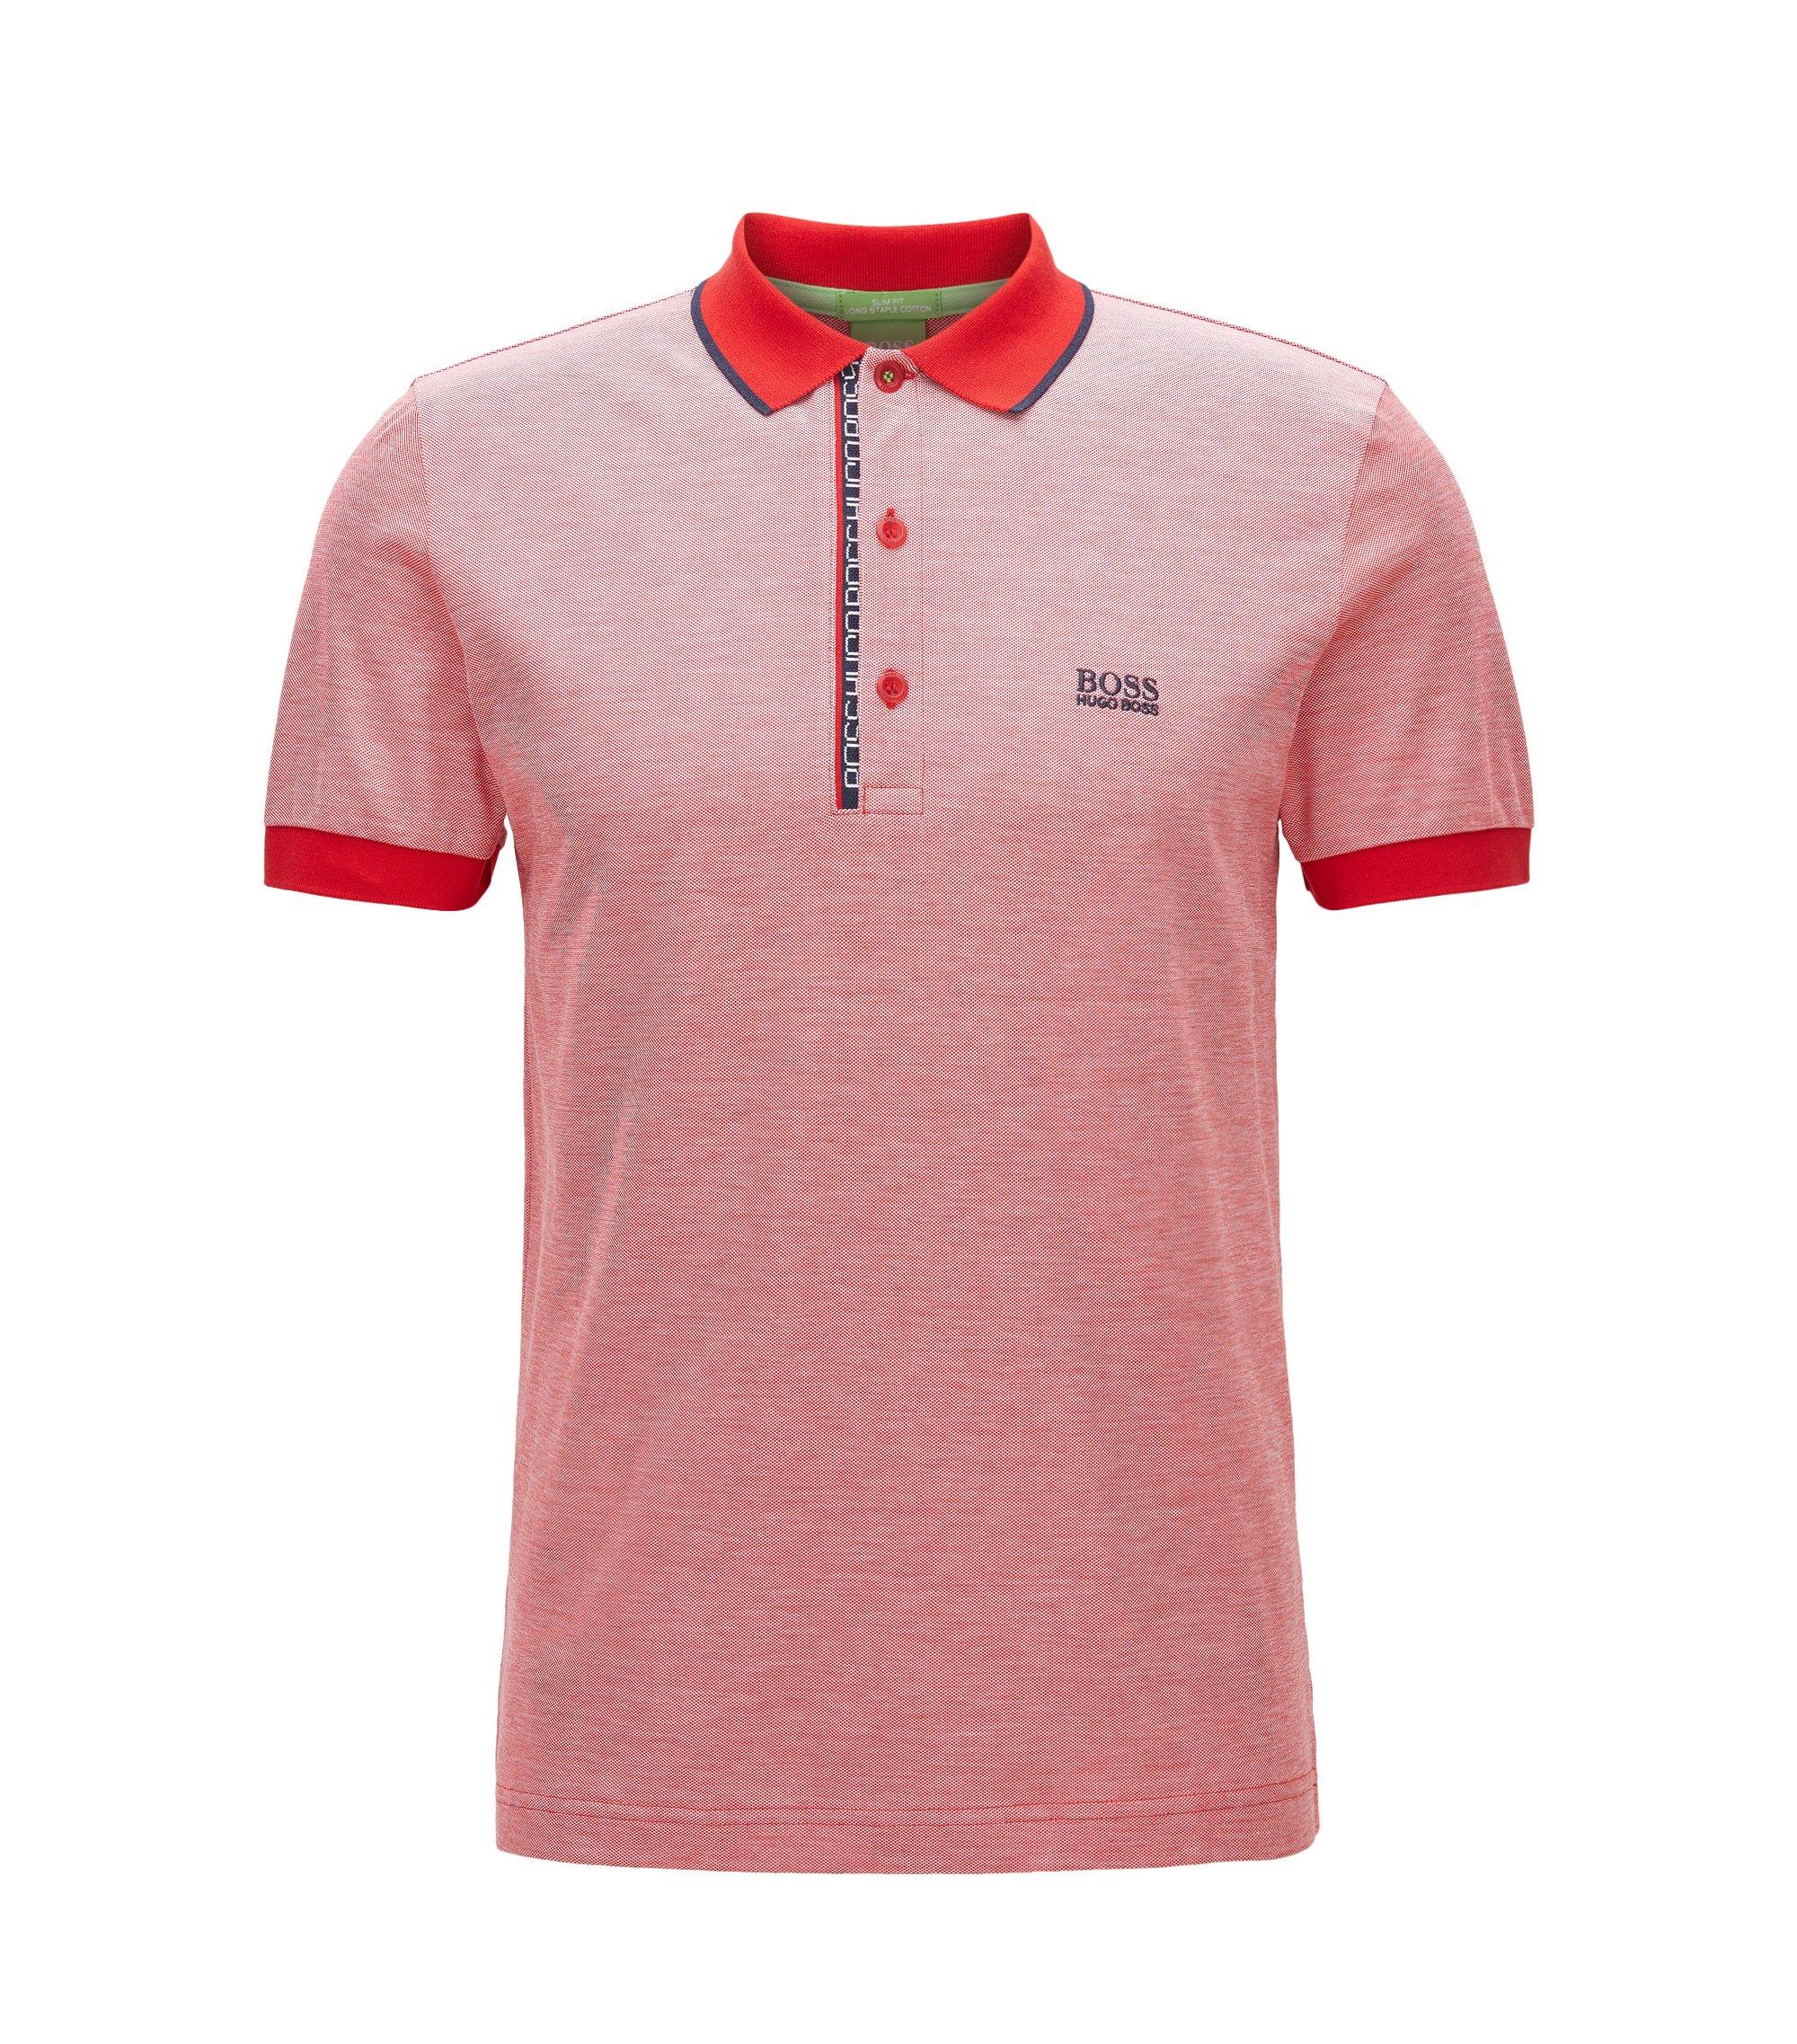 Oxfotd Cotton Polo Shirt, Slim Fit | Paule, Red